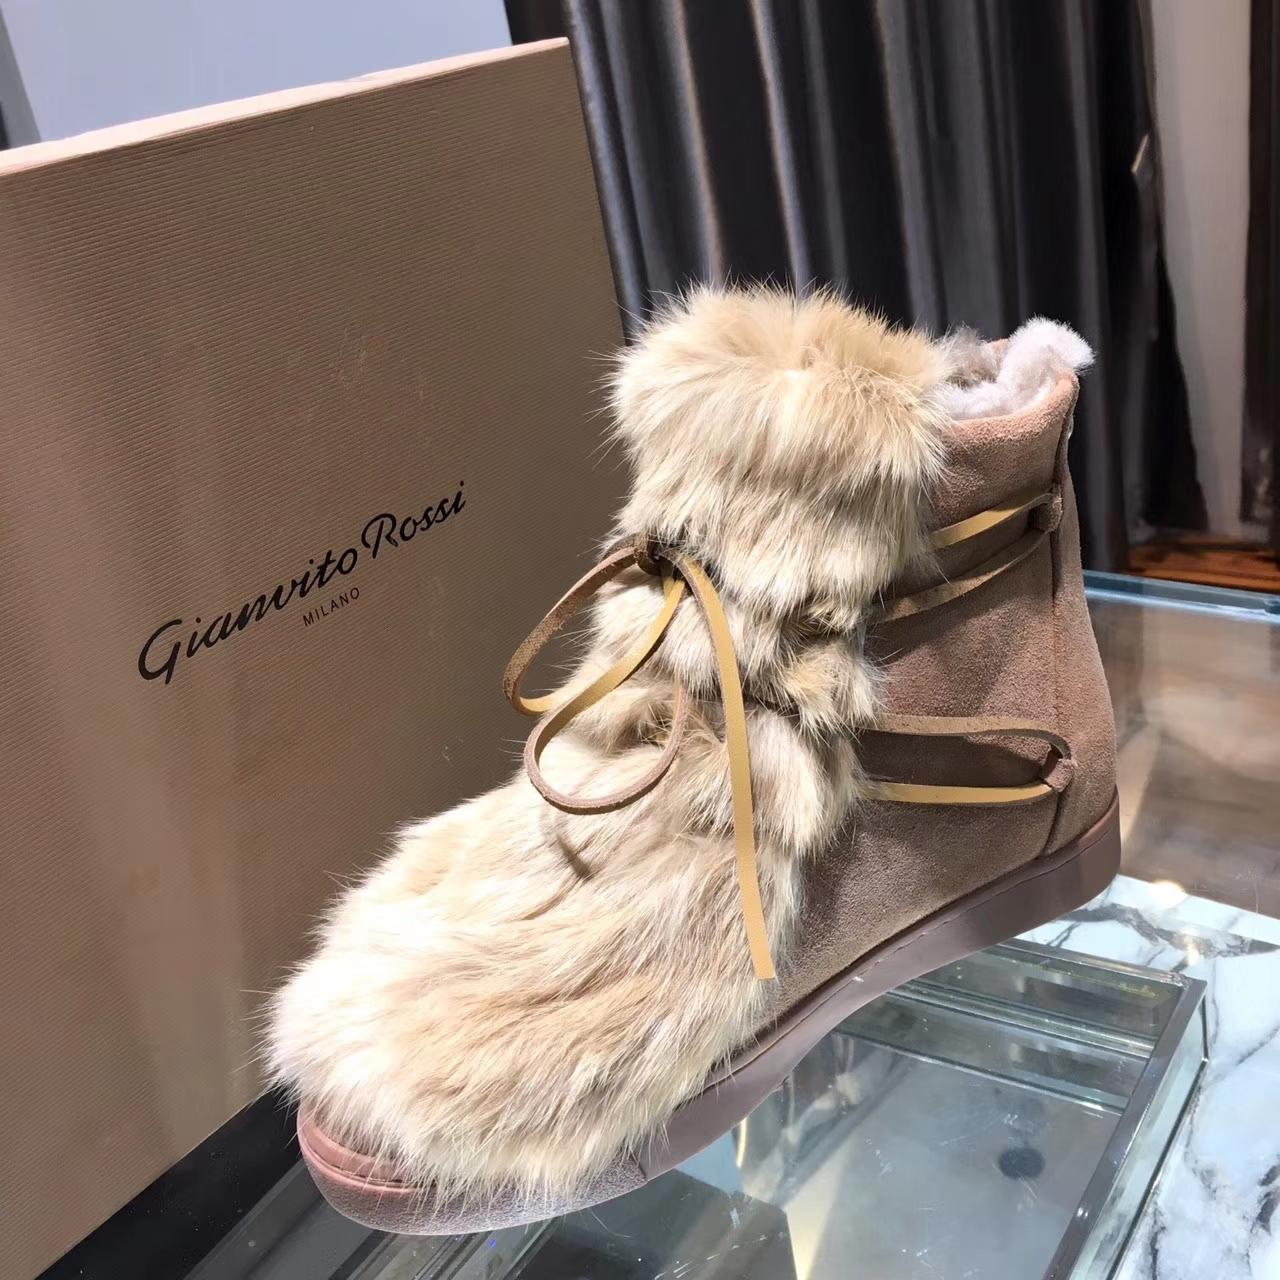 【Gianvito Rossi 】新款兔毛雪地靴